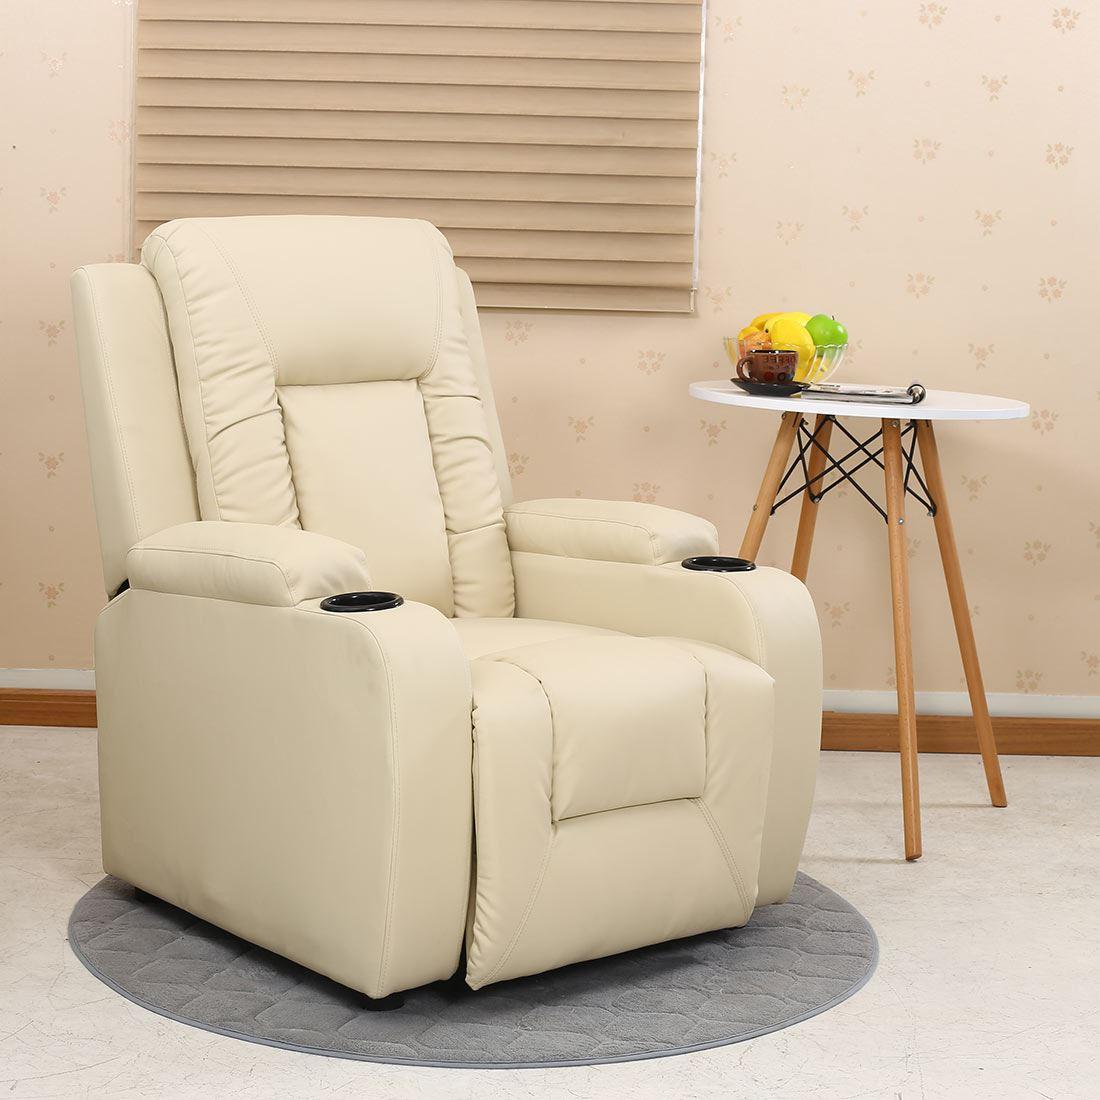 Oscar Leather Recliner W Drink Holders Armchair Sofa Chair Reclining